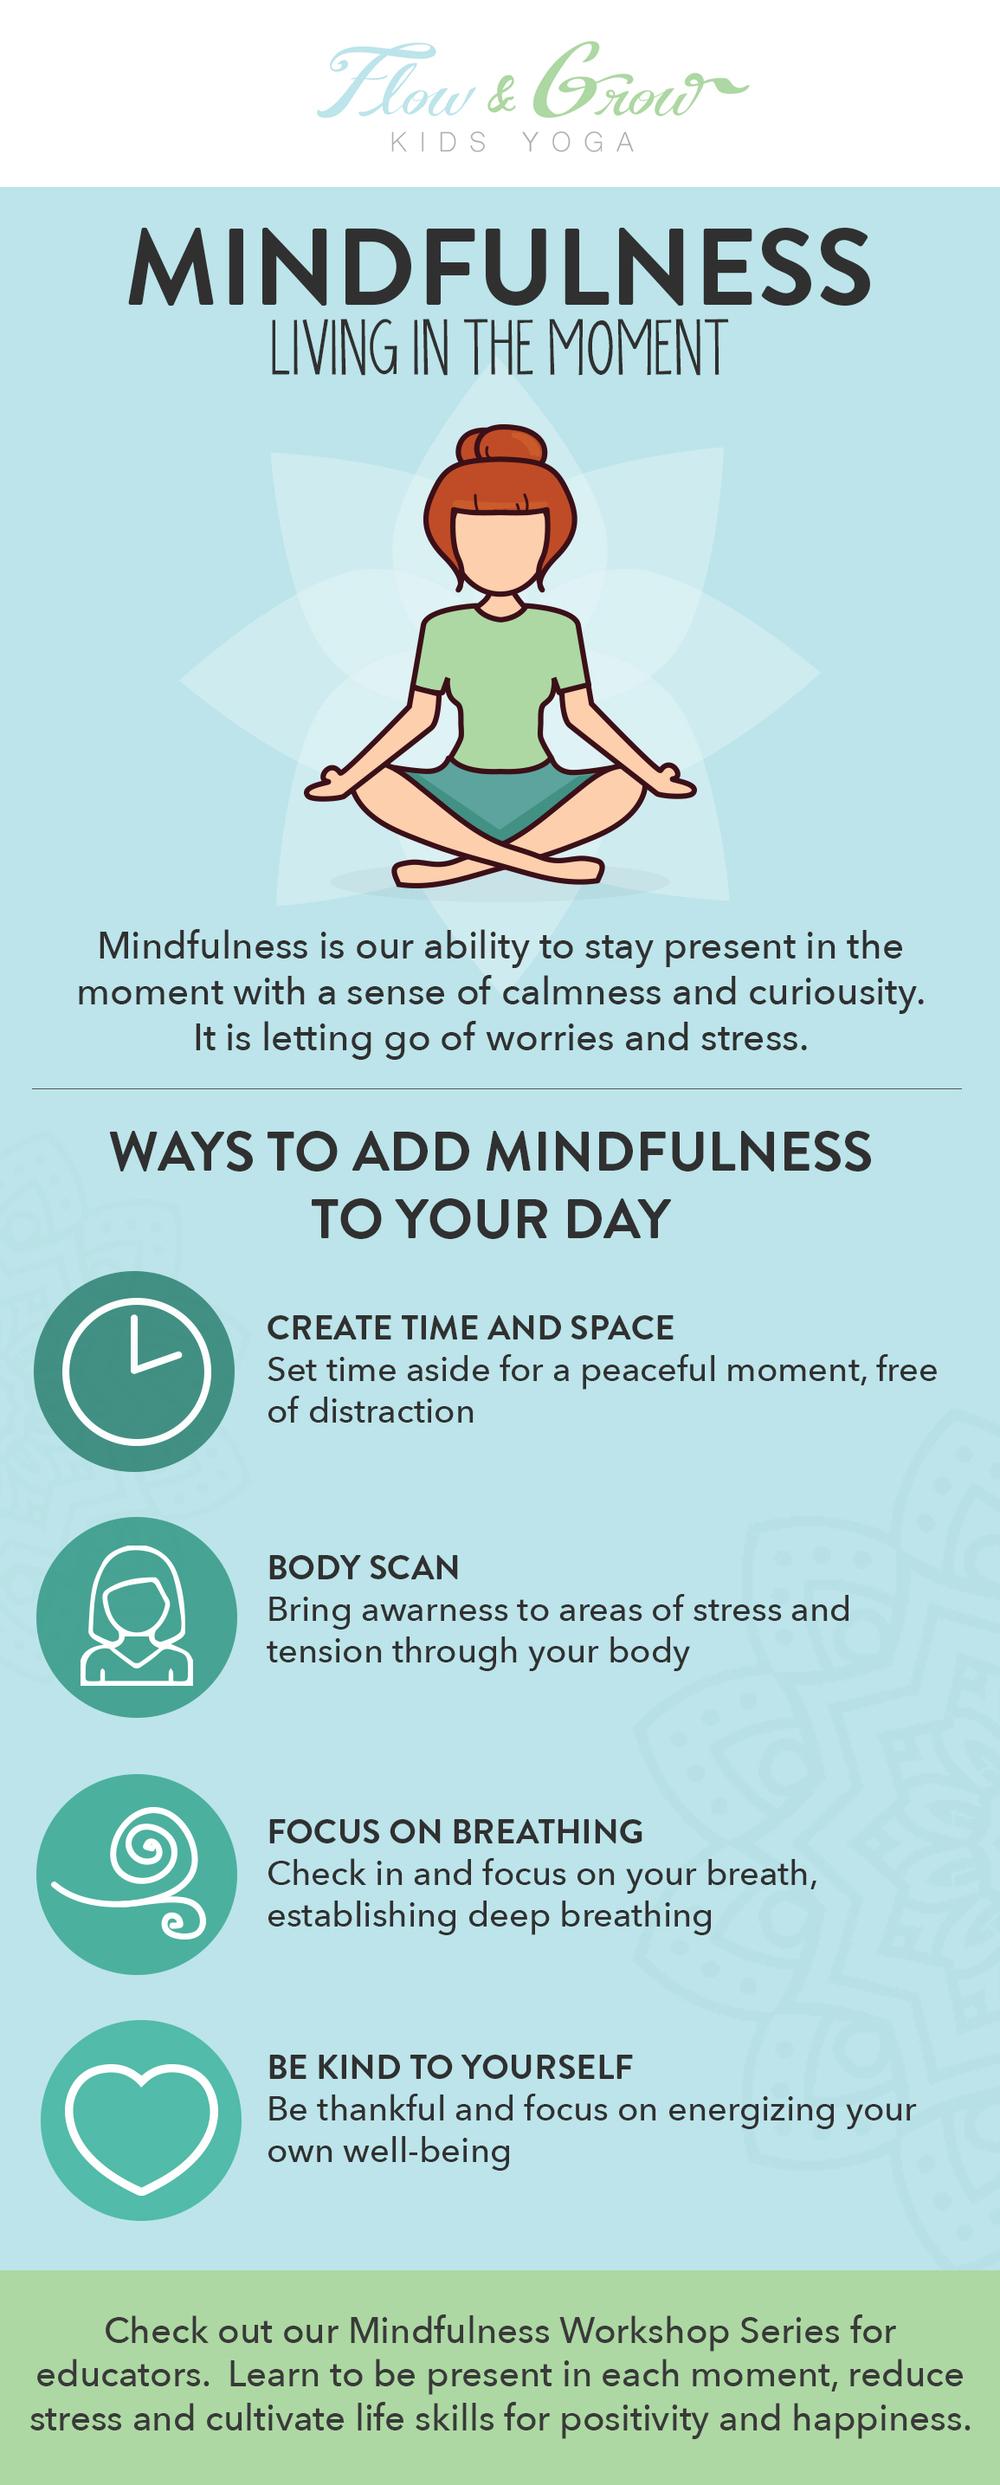 yogaMindfulness-infographic.jpg